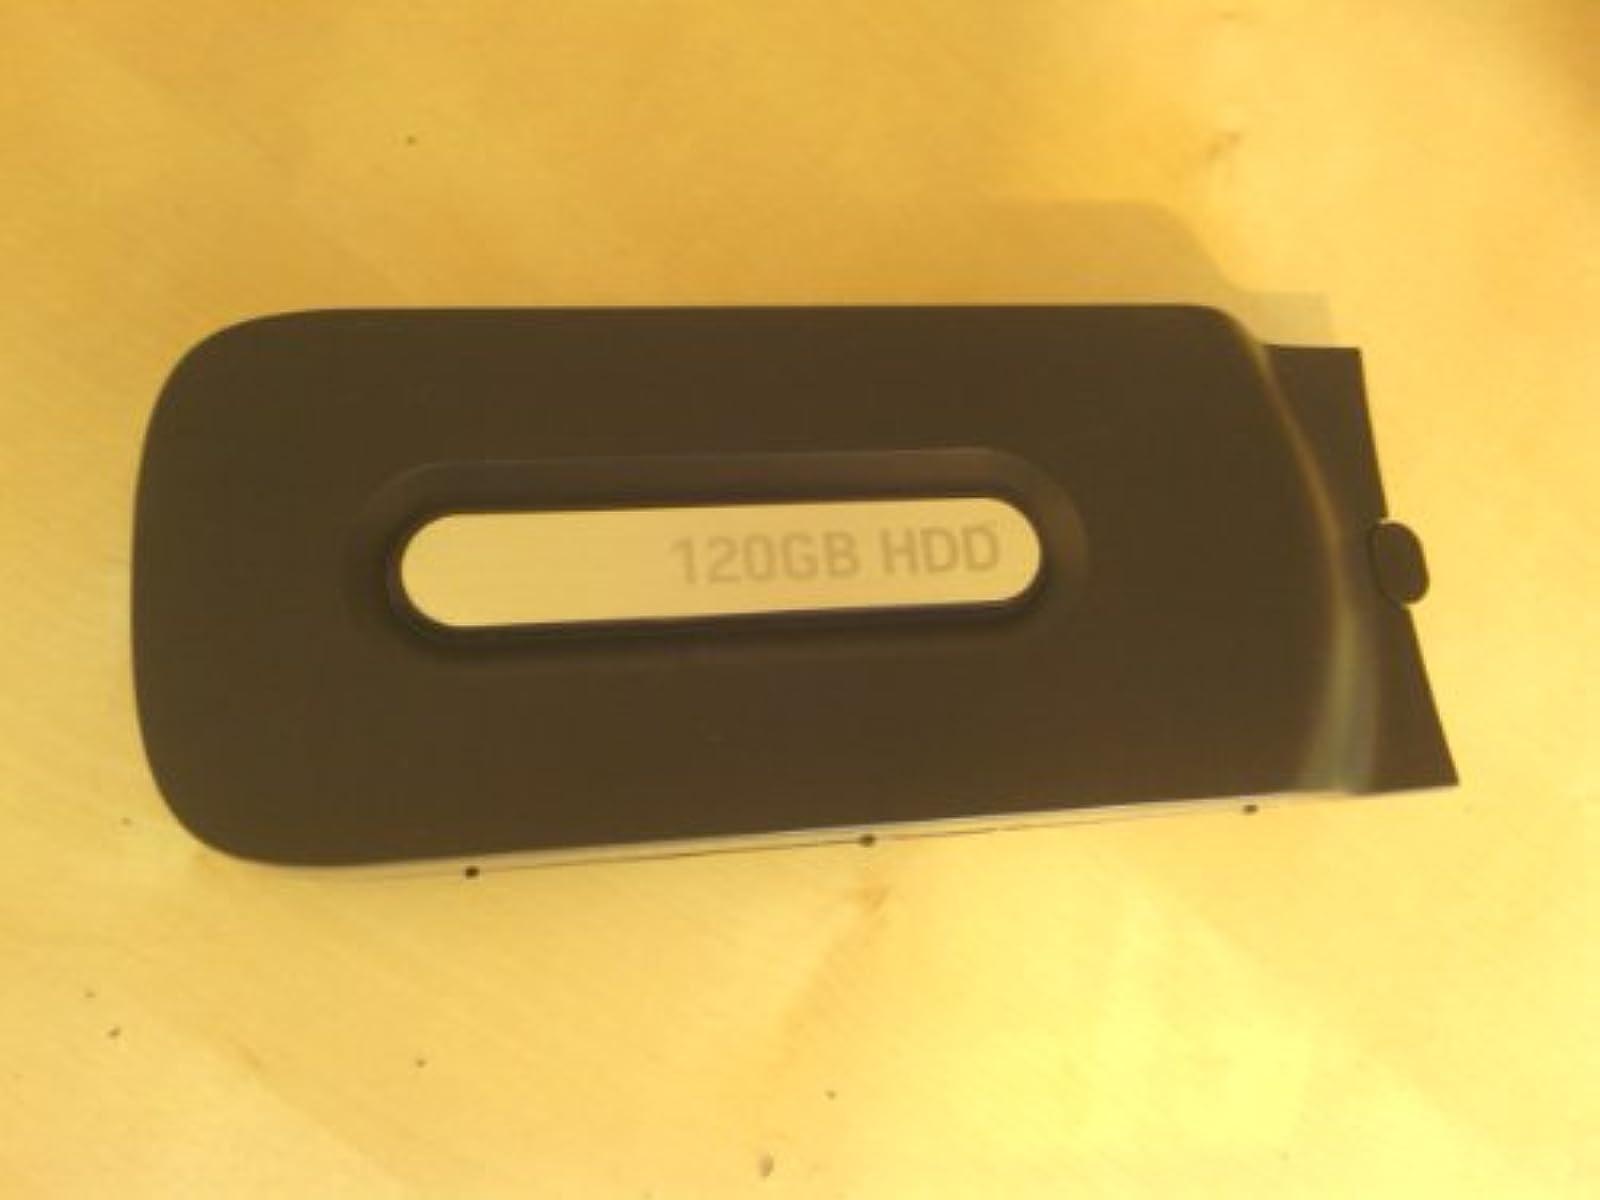 120GB Hard Drive For Xbox 360 Generic